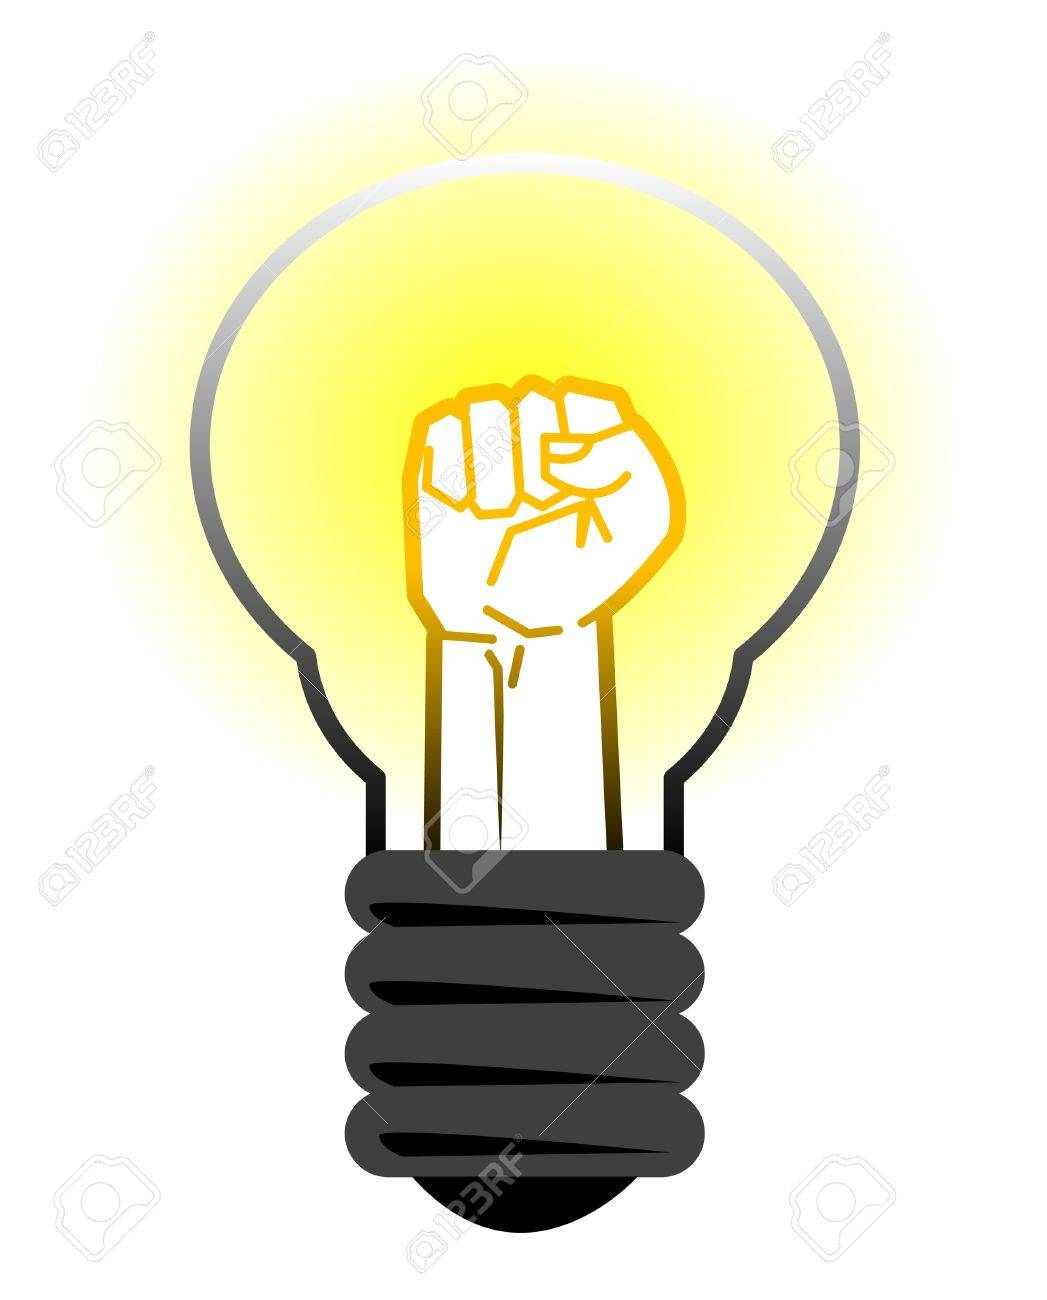 Fist in light bulb Stock Vector - 14600088